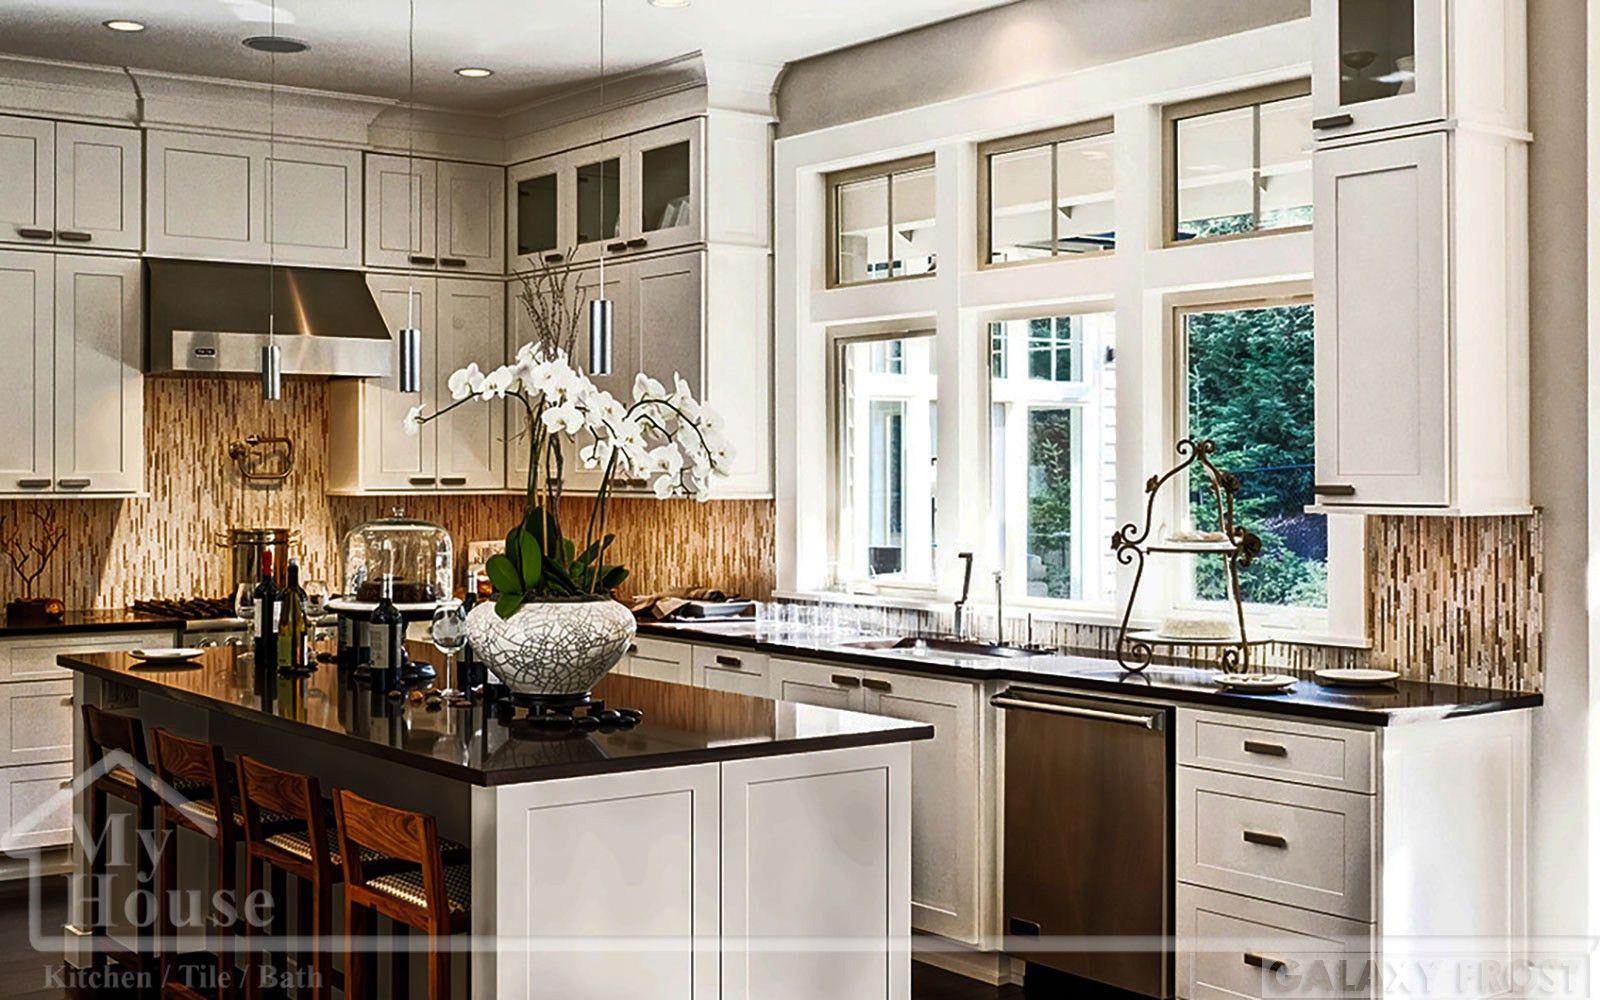 2018 Newark Cabinets Newark Nj Remodeling Ideas For Kitchens Check More At Http Www Planetgr Kitchen Remodel Small Kitchen Cabinets For Sale Kitchen Design